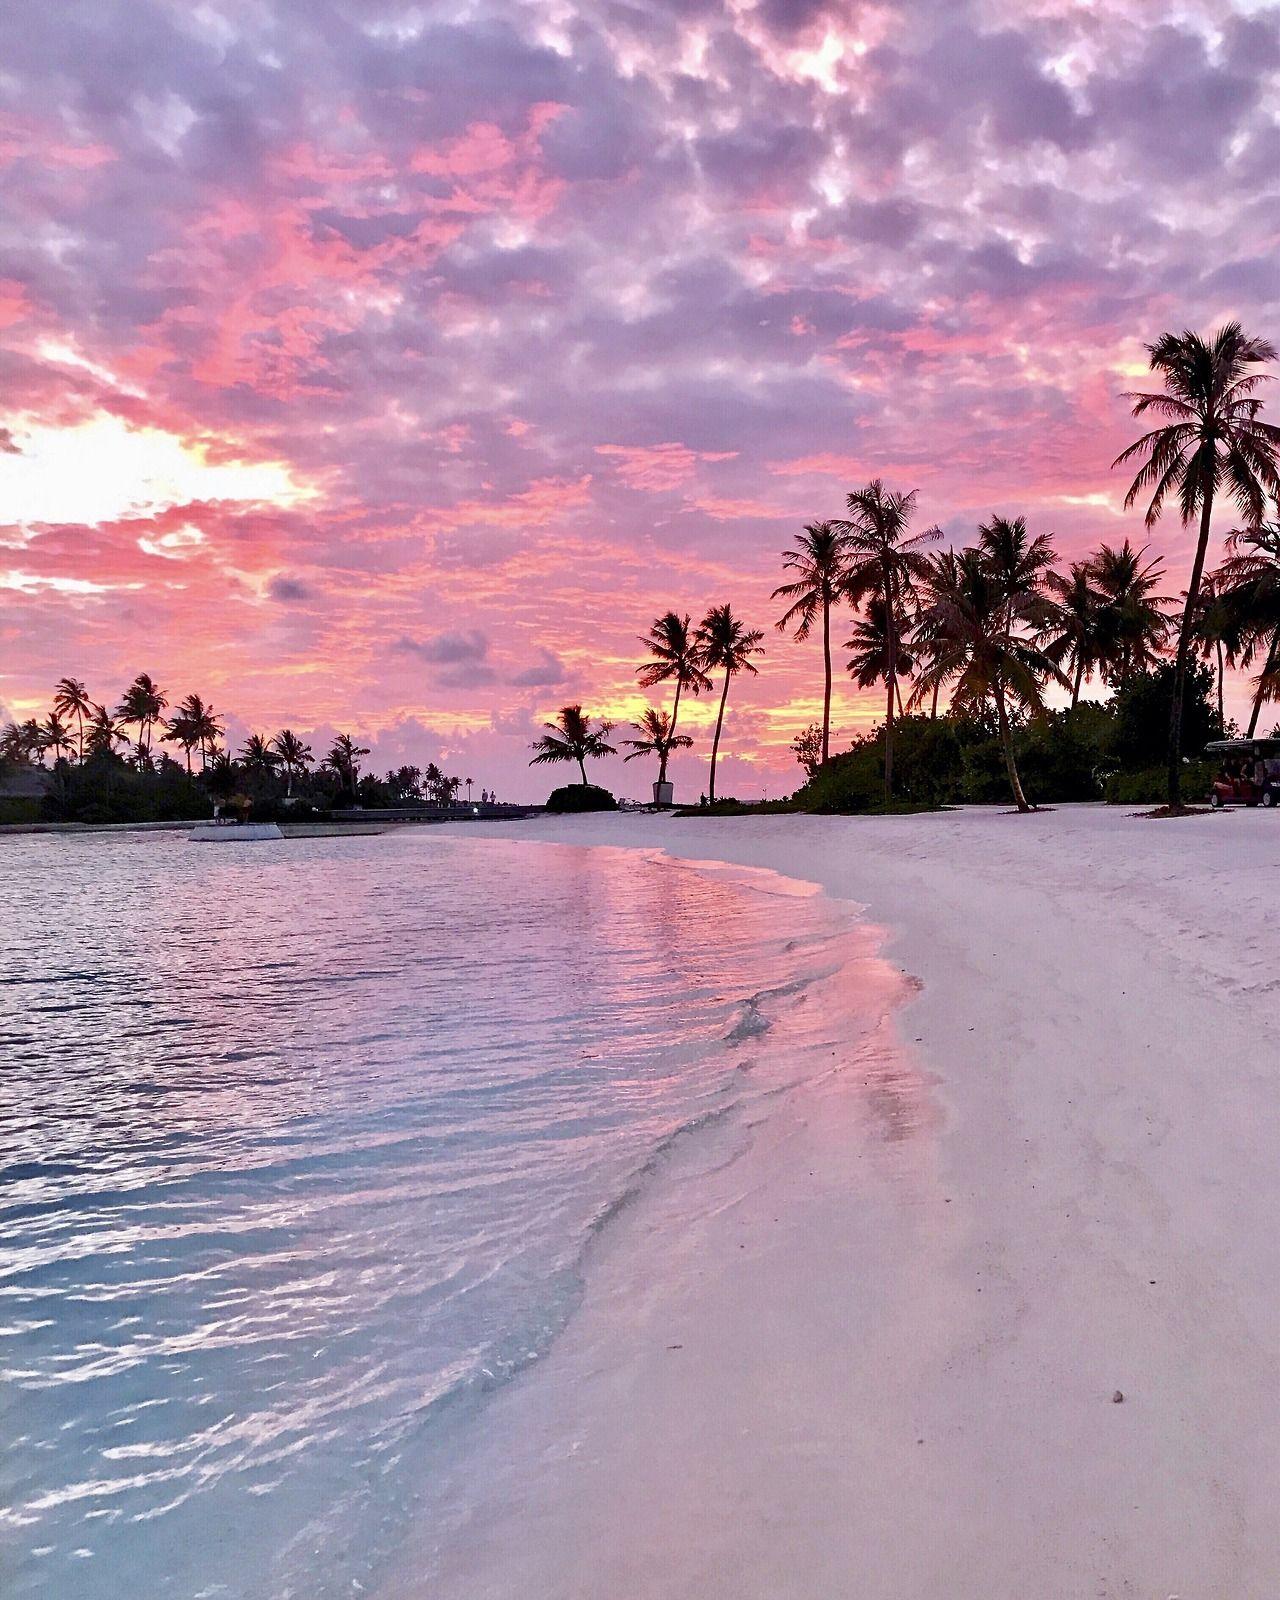 Https Casadmalibu Tumblr Com Post 167832208134 Oceancuresall O C E A Ninstagramvepportilla Nature Photography Beautiful Landscapes Beautiful Nature